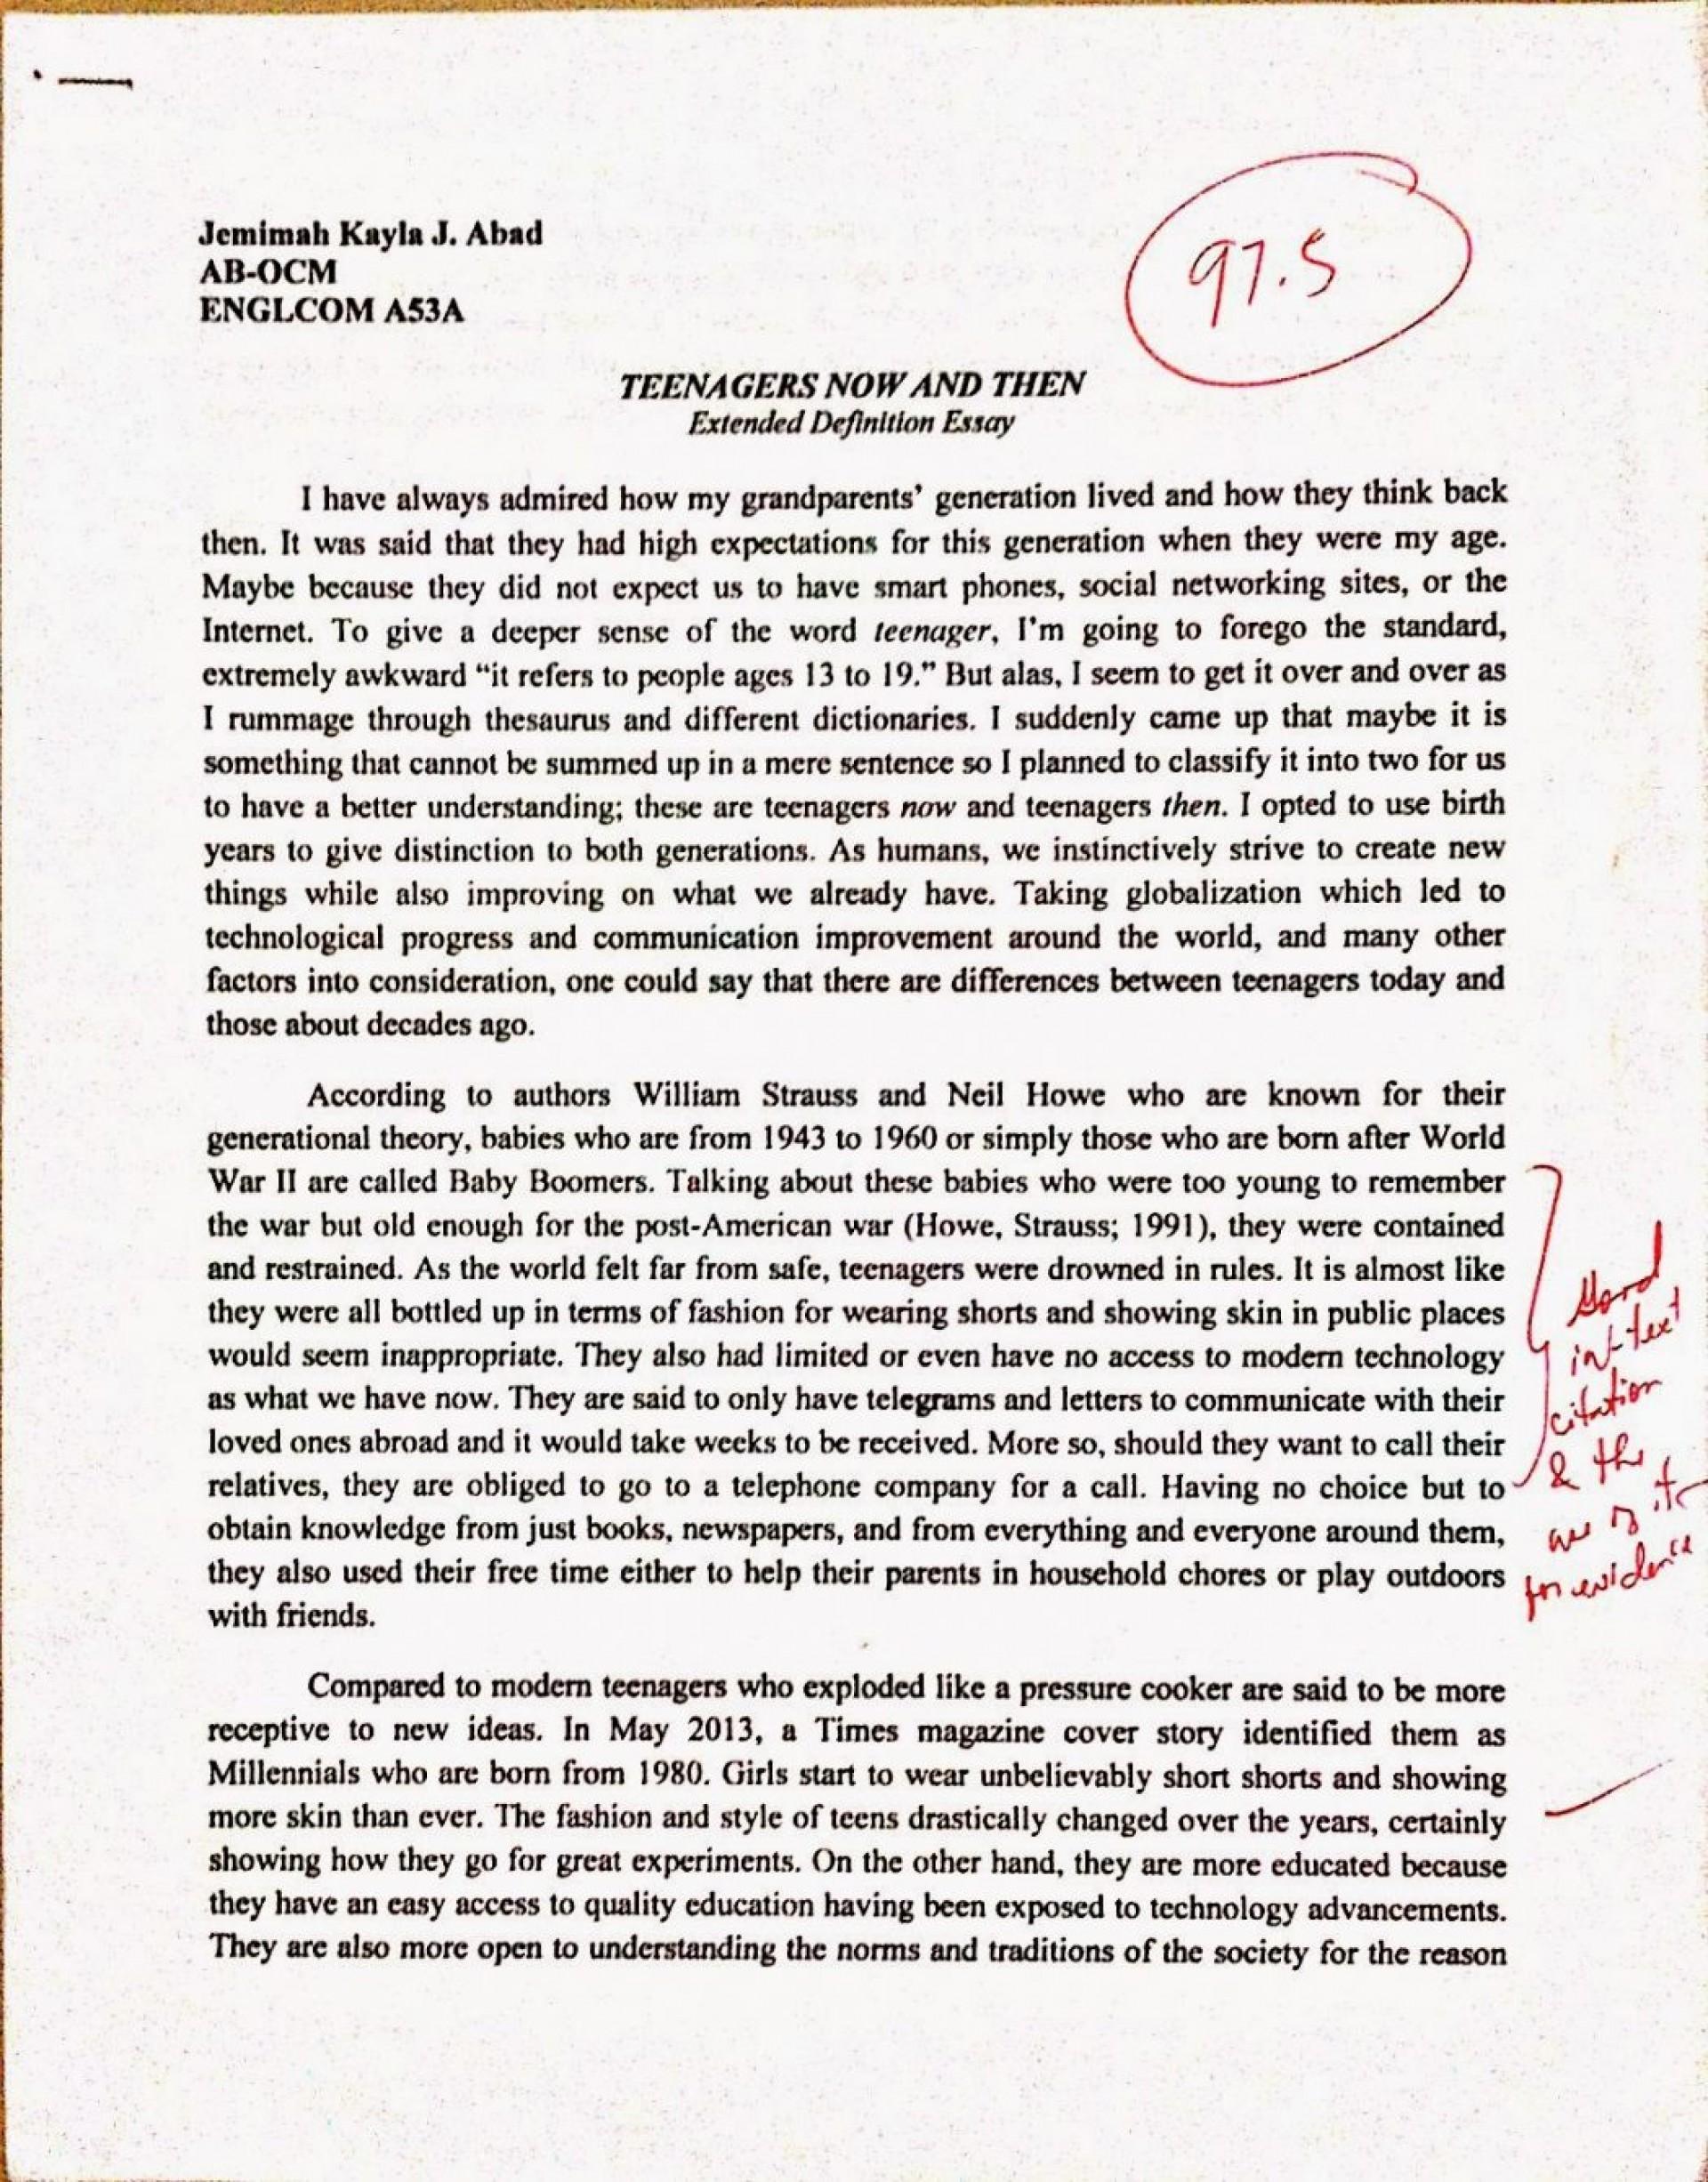 020 Persuasive Essay Definition Sample Argumentative Tip Outline Tips Writing Good Pdf Gre Ielts Icse Ap Lang And Tricks 1048x1339 Fearsome Define Persuasive/argumentative 1920